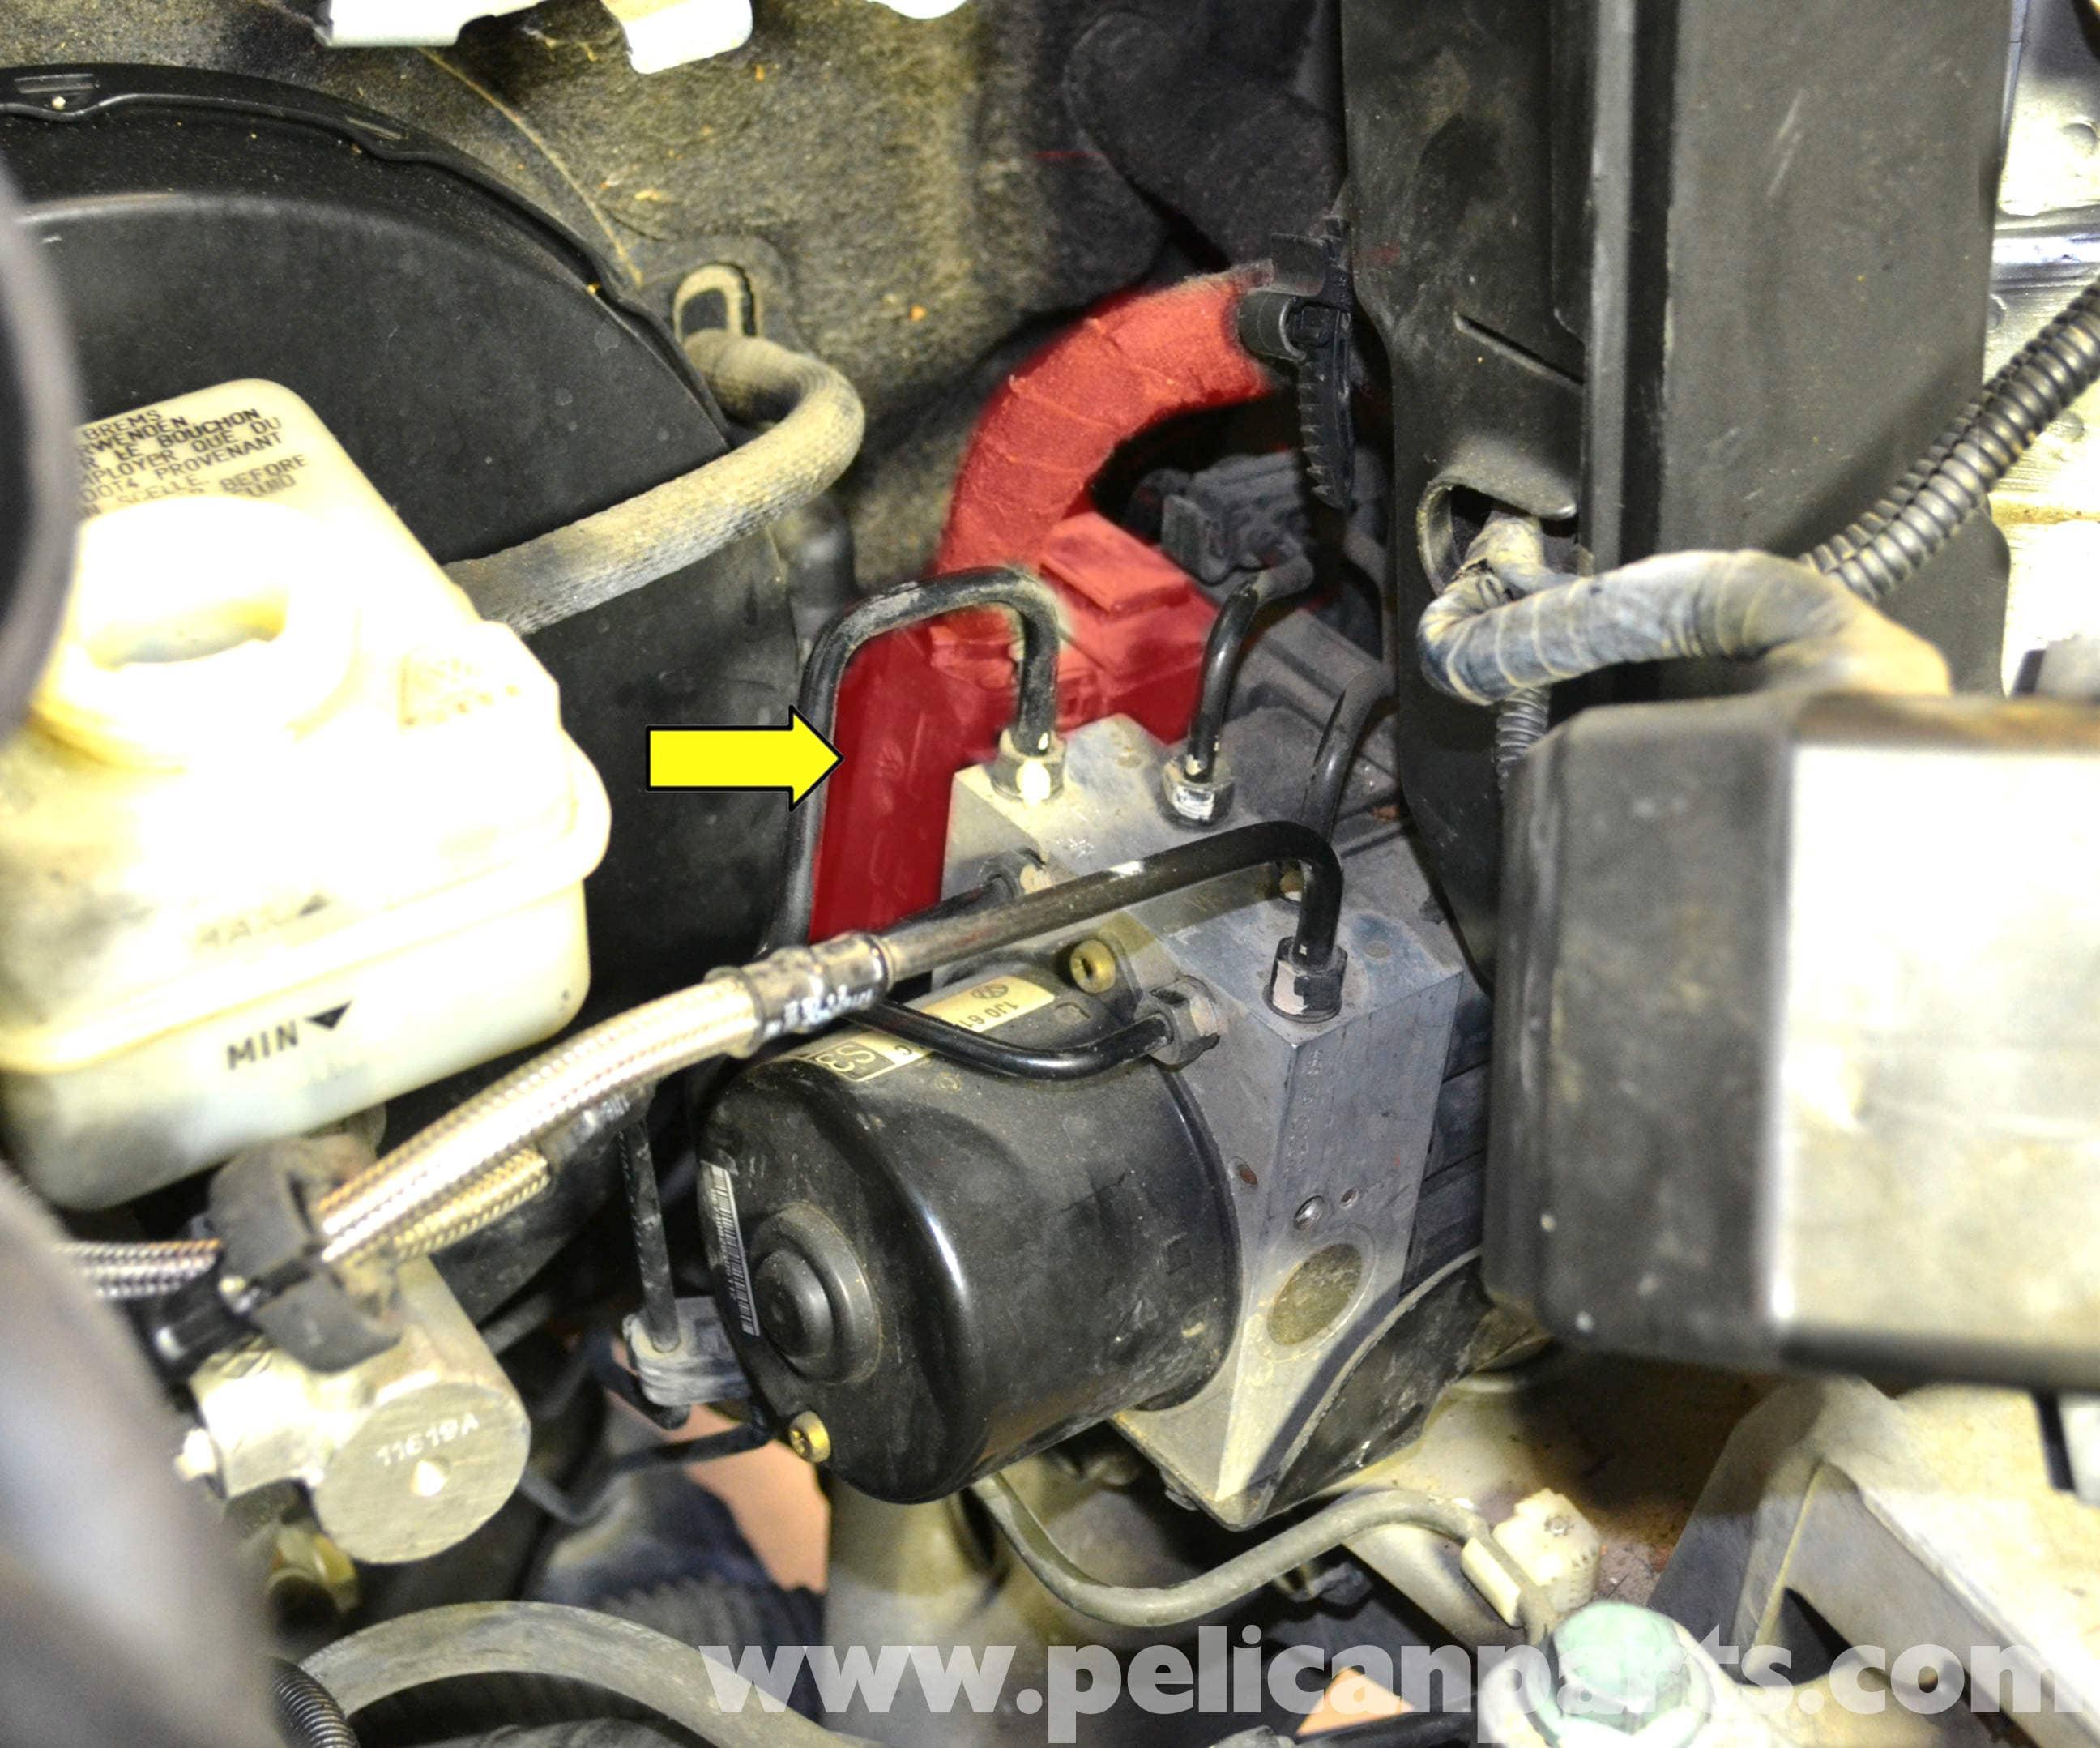 Volkswagen Golf GTI Mk IV ABS Control Module Replacement